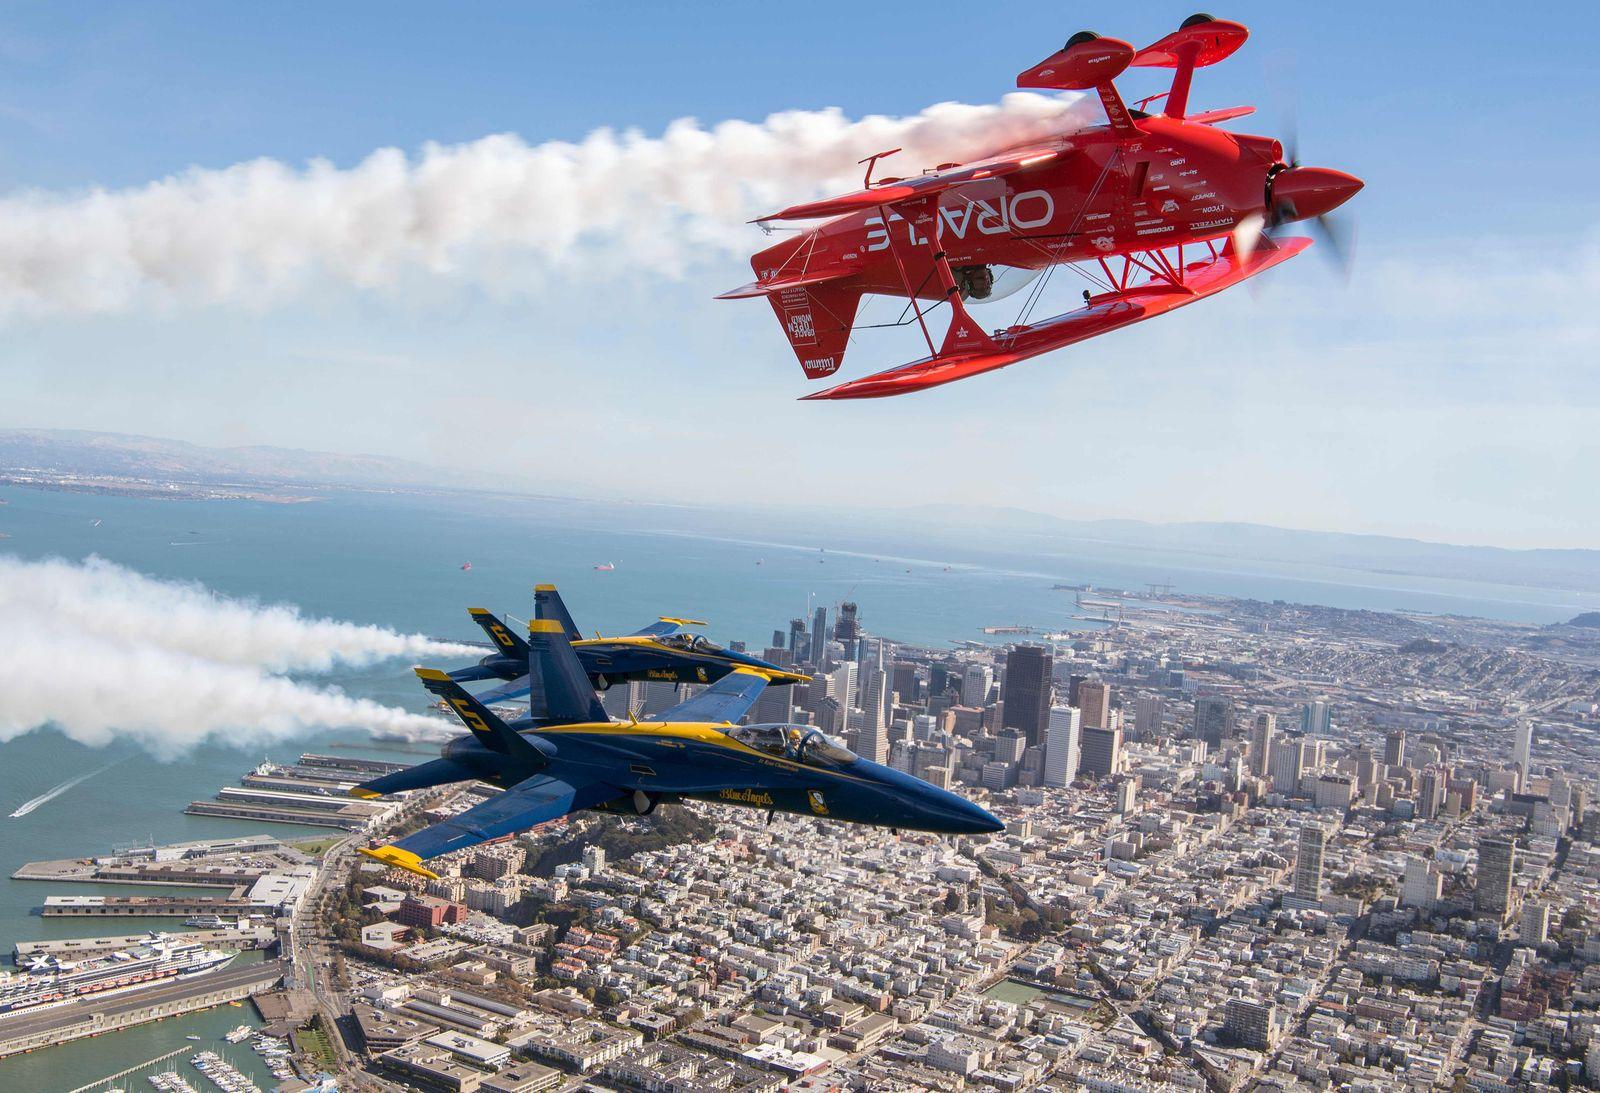 San Francisco / Flugshow